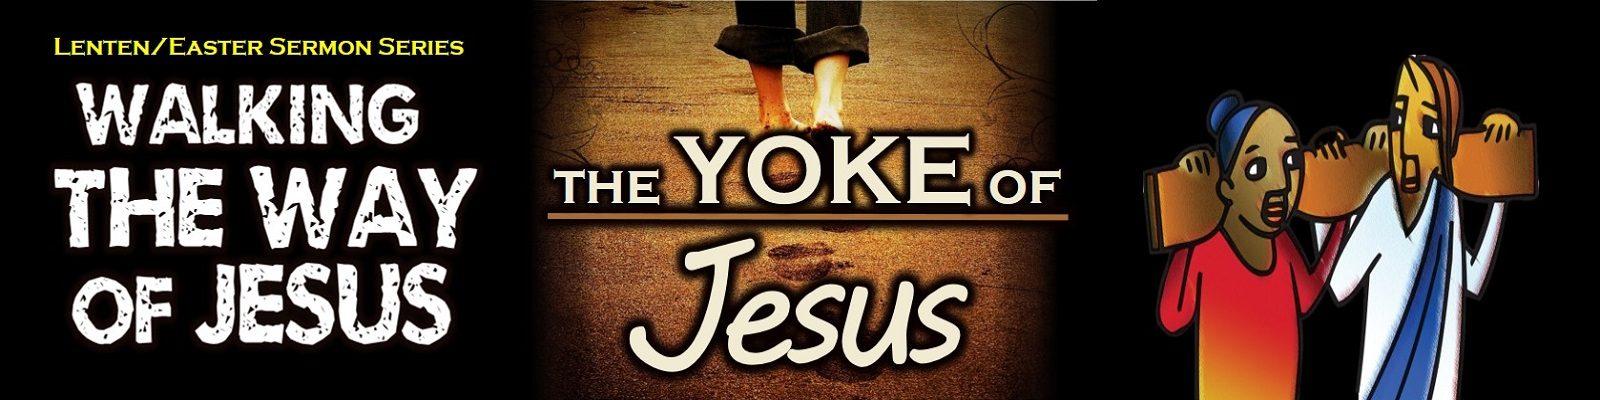 The Way Study #1 - The Yoke